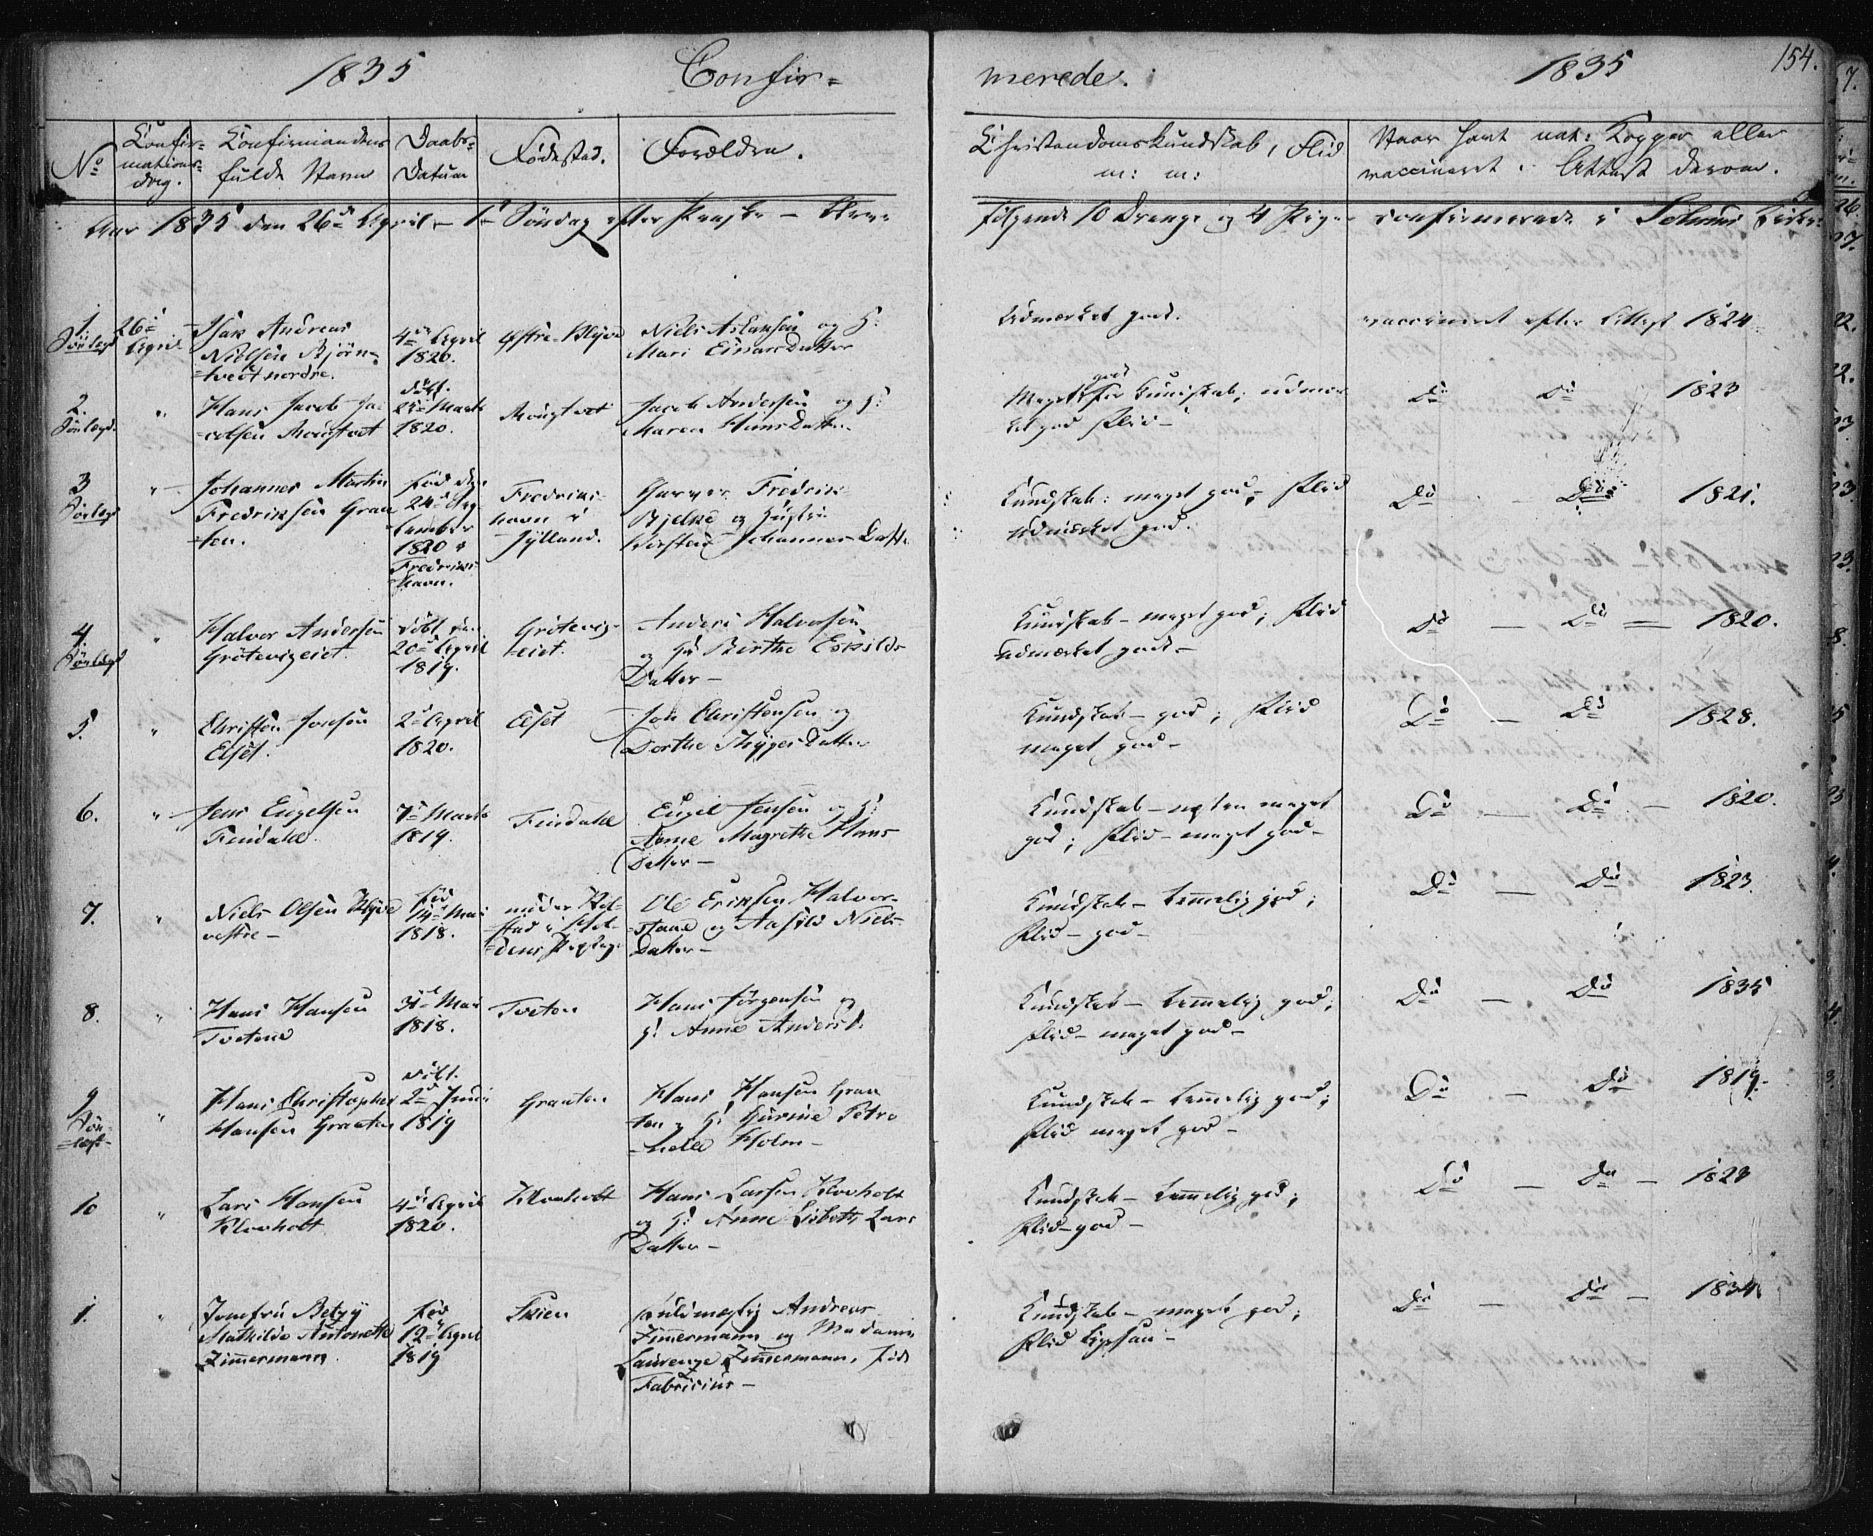 SAKO, Solum kirkebøker, F/Fa/L0005: Ministerialbok nr. I 5, 1833-1843, s. 154